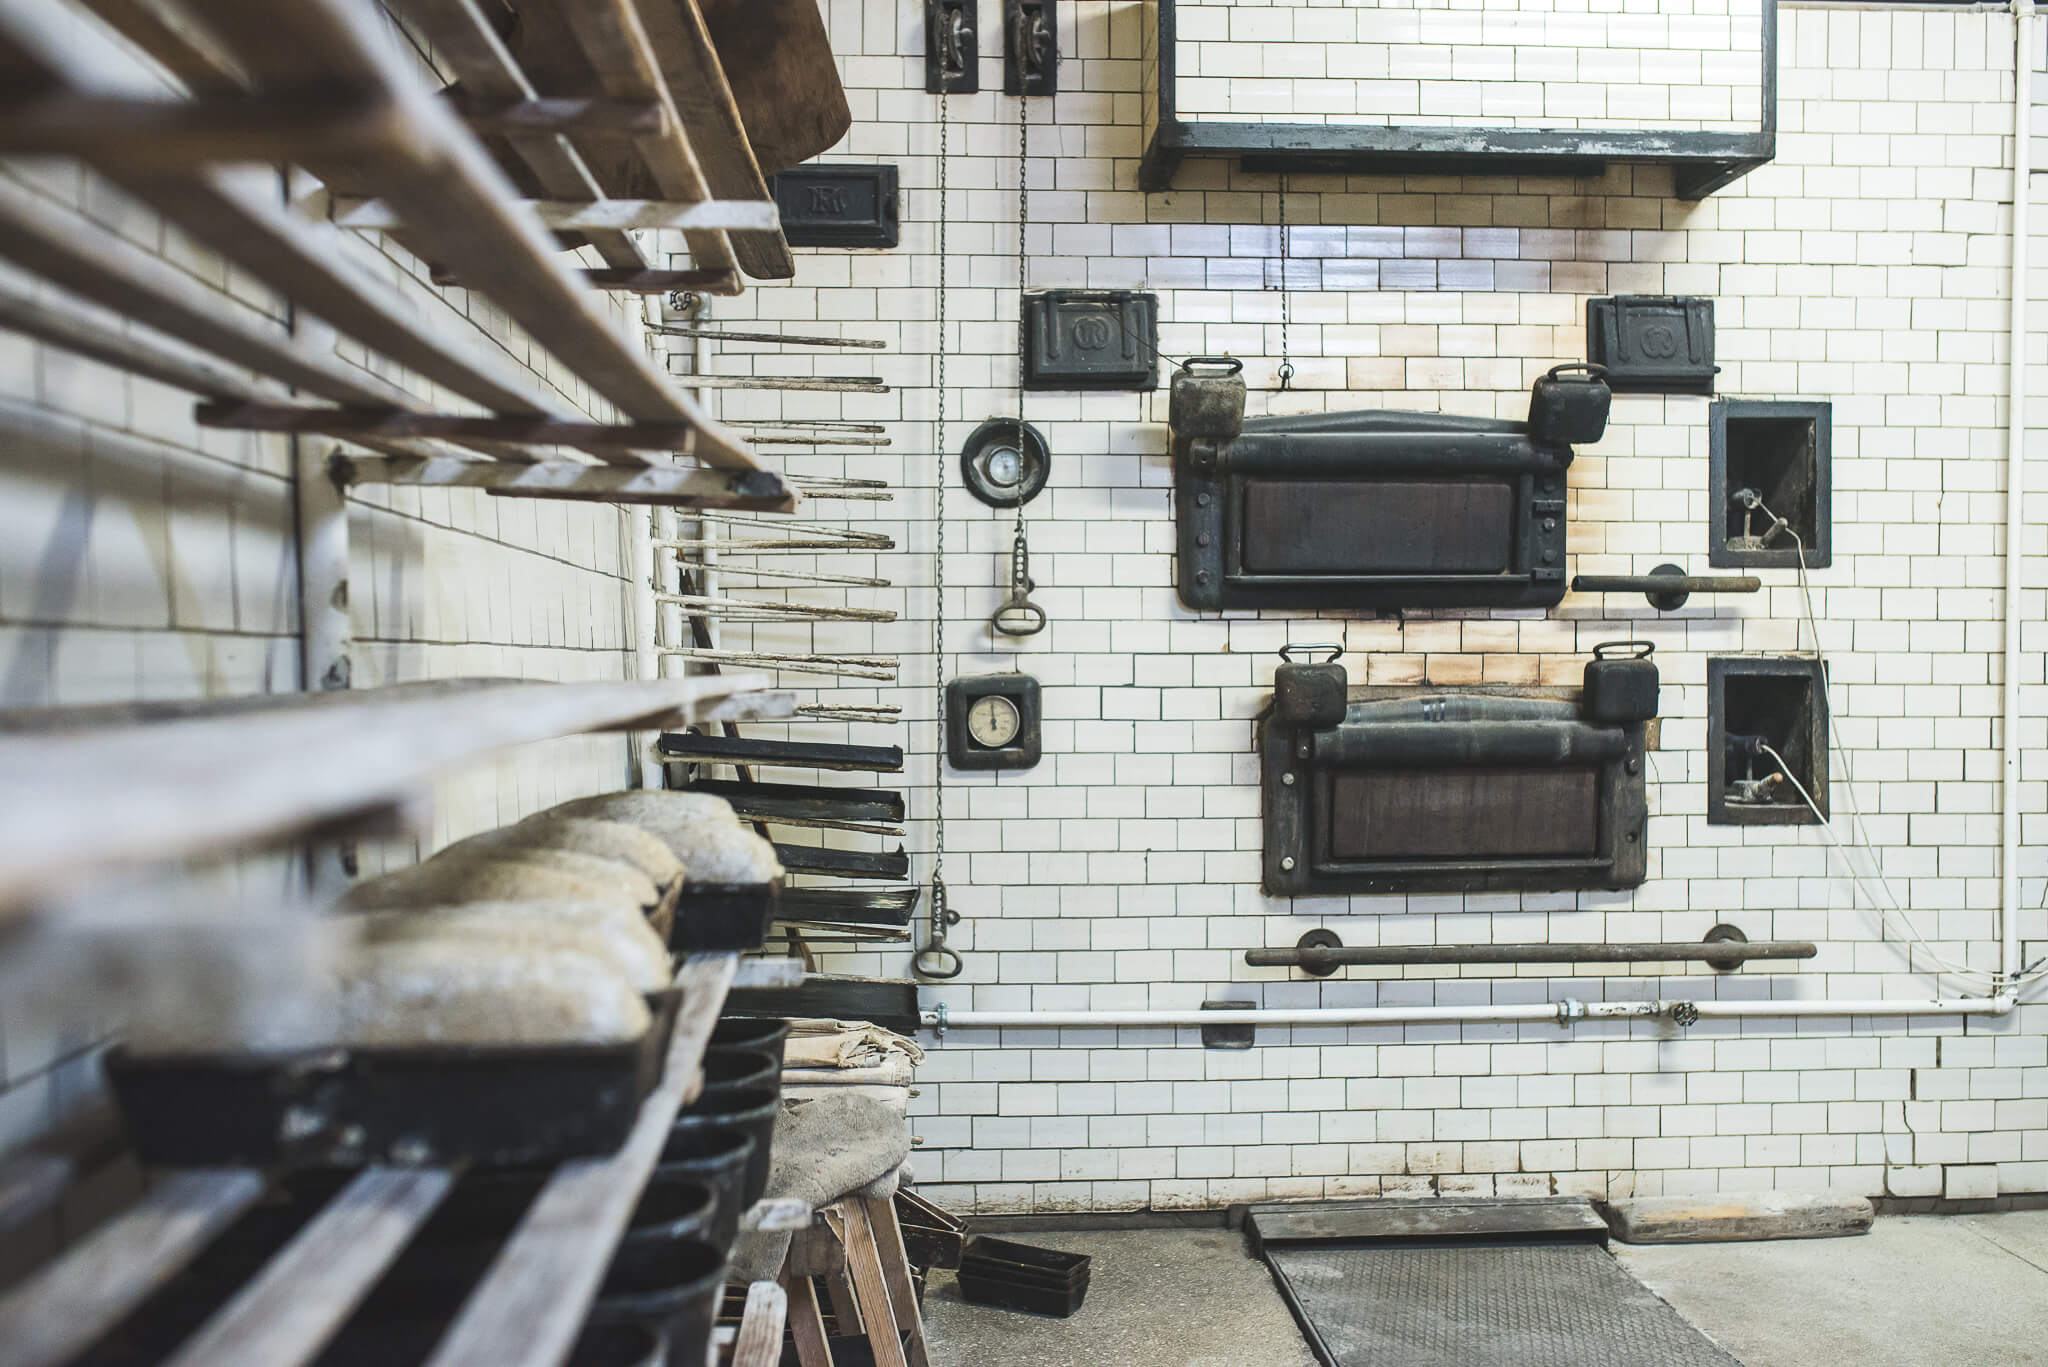 Majchrowski 14 1 - Artisan bread in pomorskie - tradition and modernity